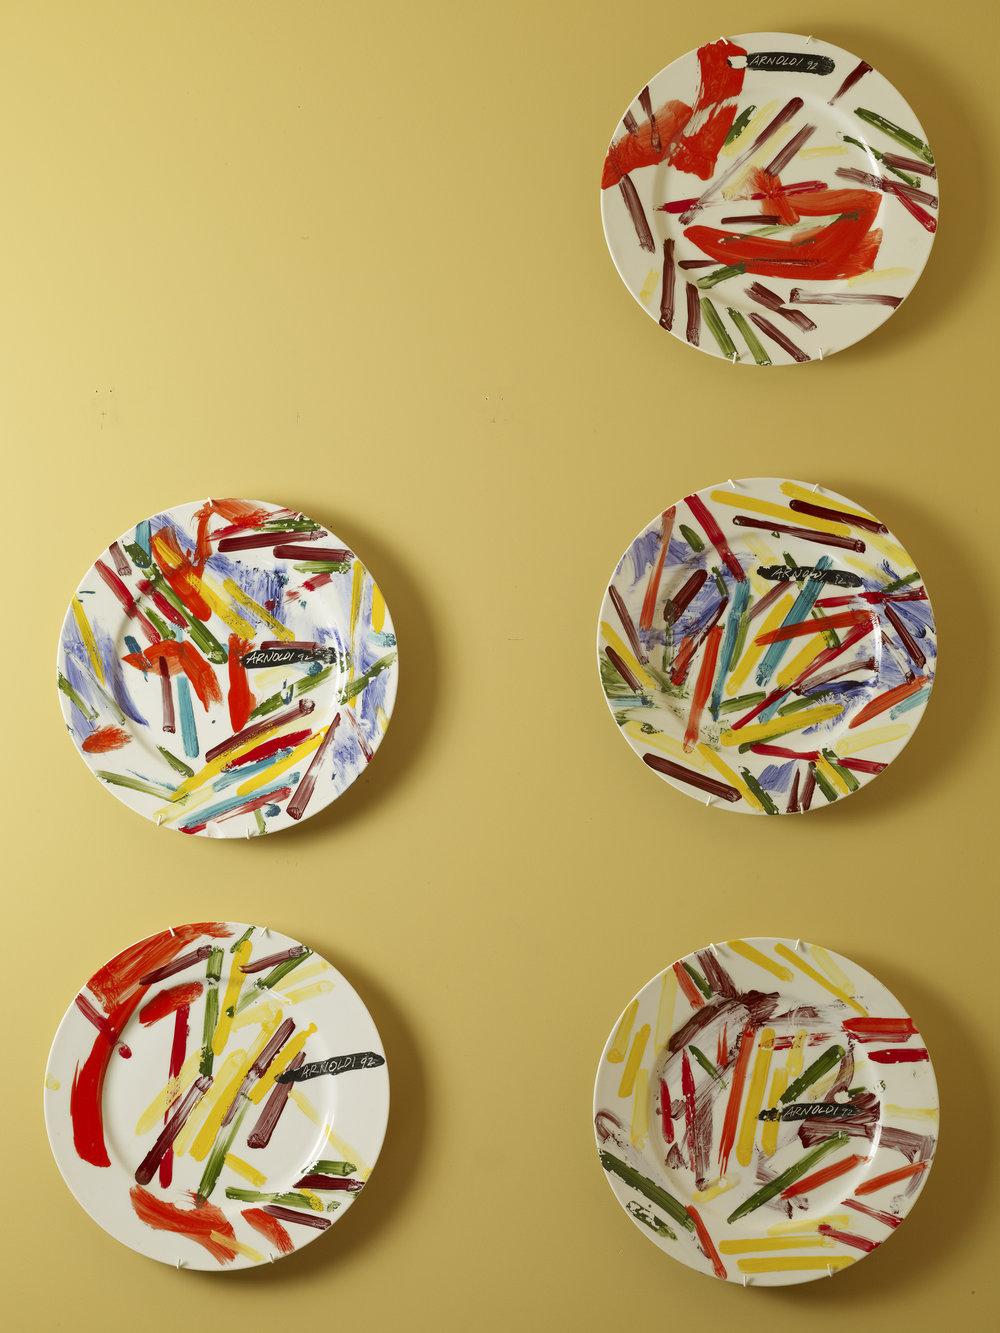 Unititled Charles Arnoldi 1992 - oil on five Taitu Emillio Bargamin dinner plates each 31x31.jpg